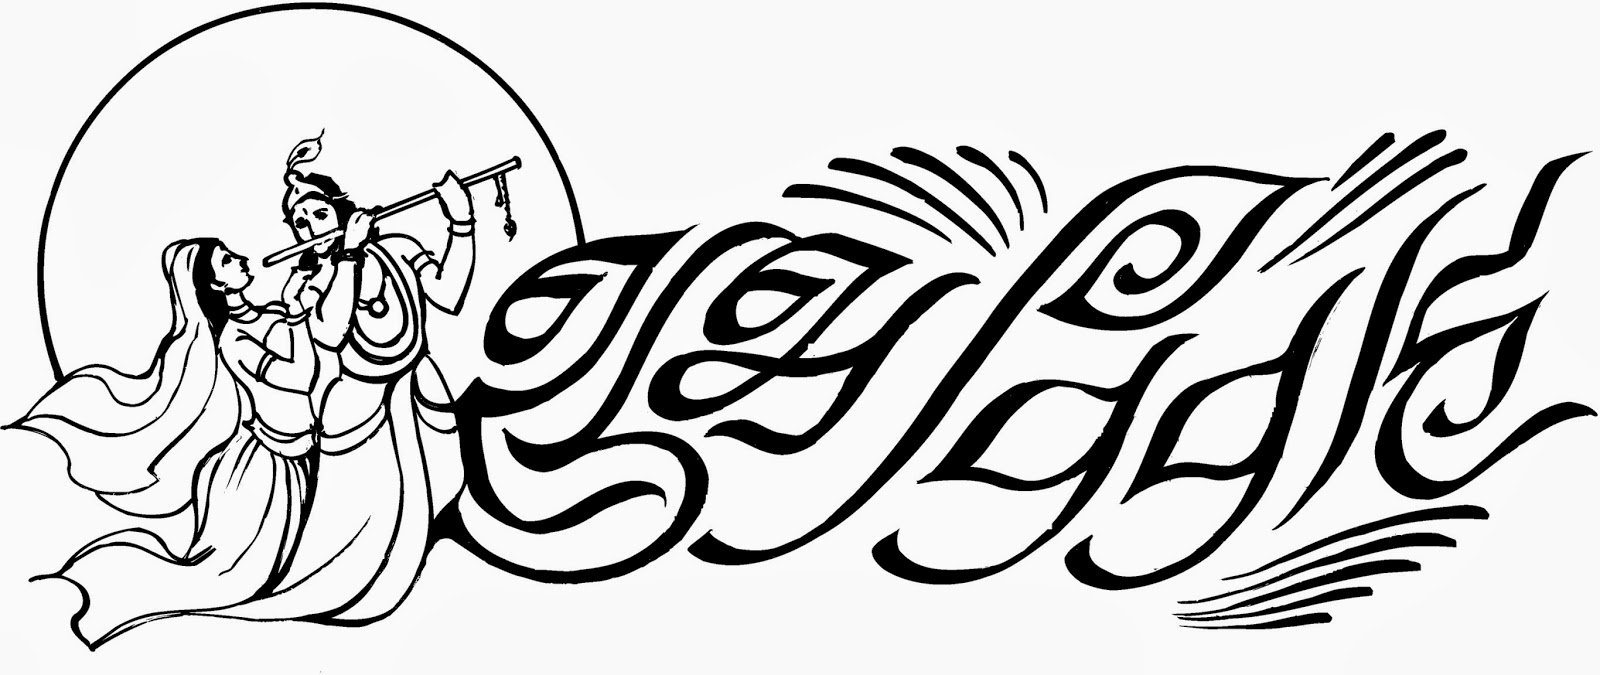 Hindi Shubh Vivah Logo Clipart Clipartsgram Com